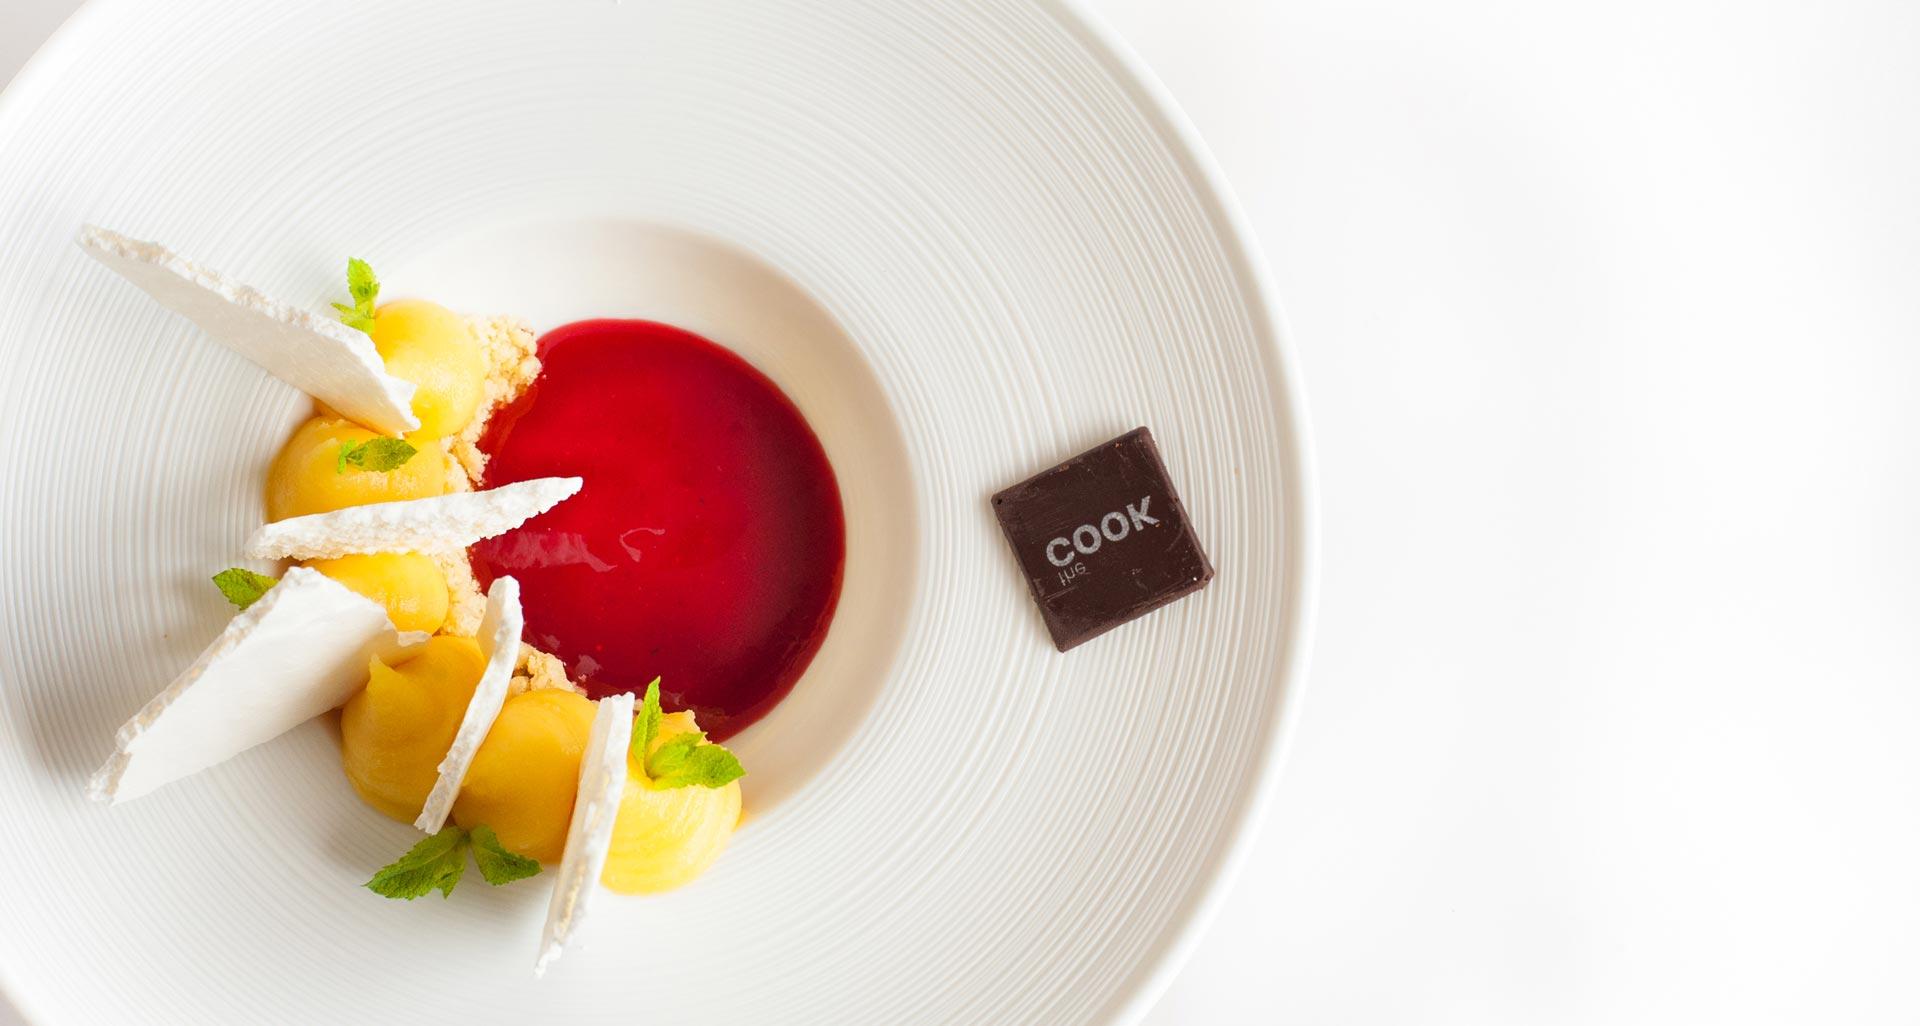 The Cook Restaurant - Arenzano